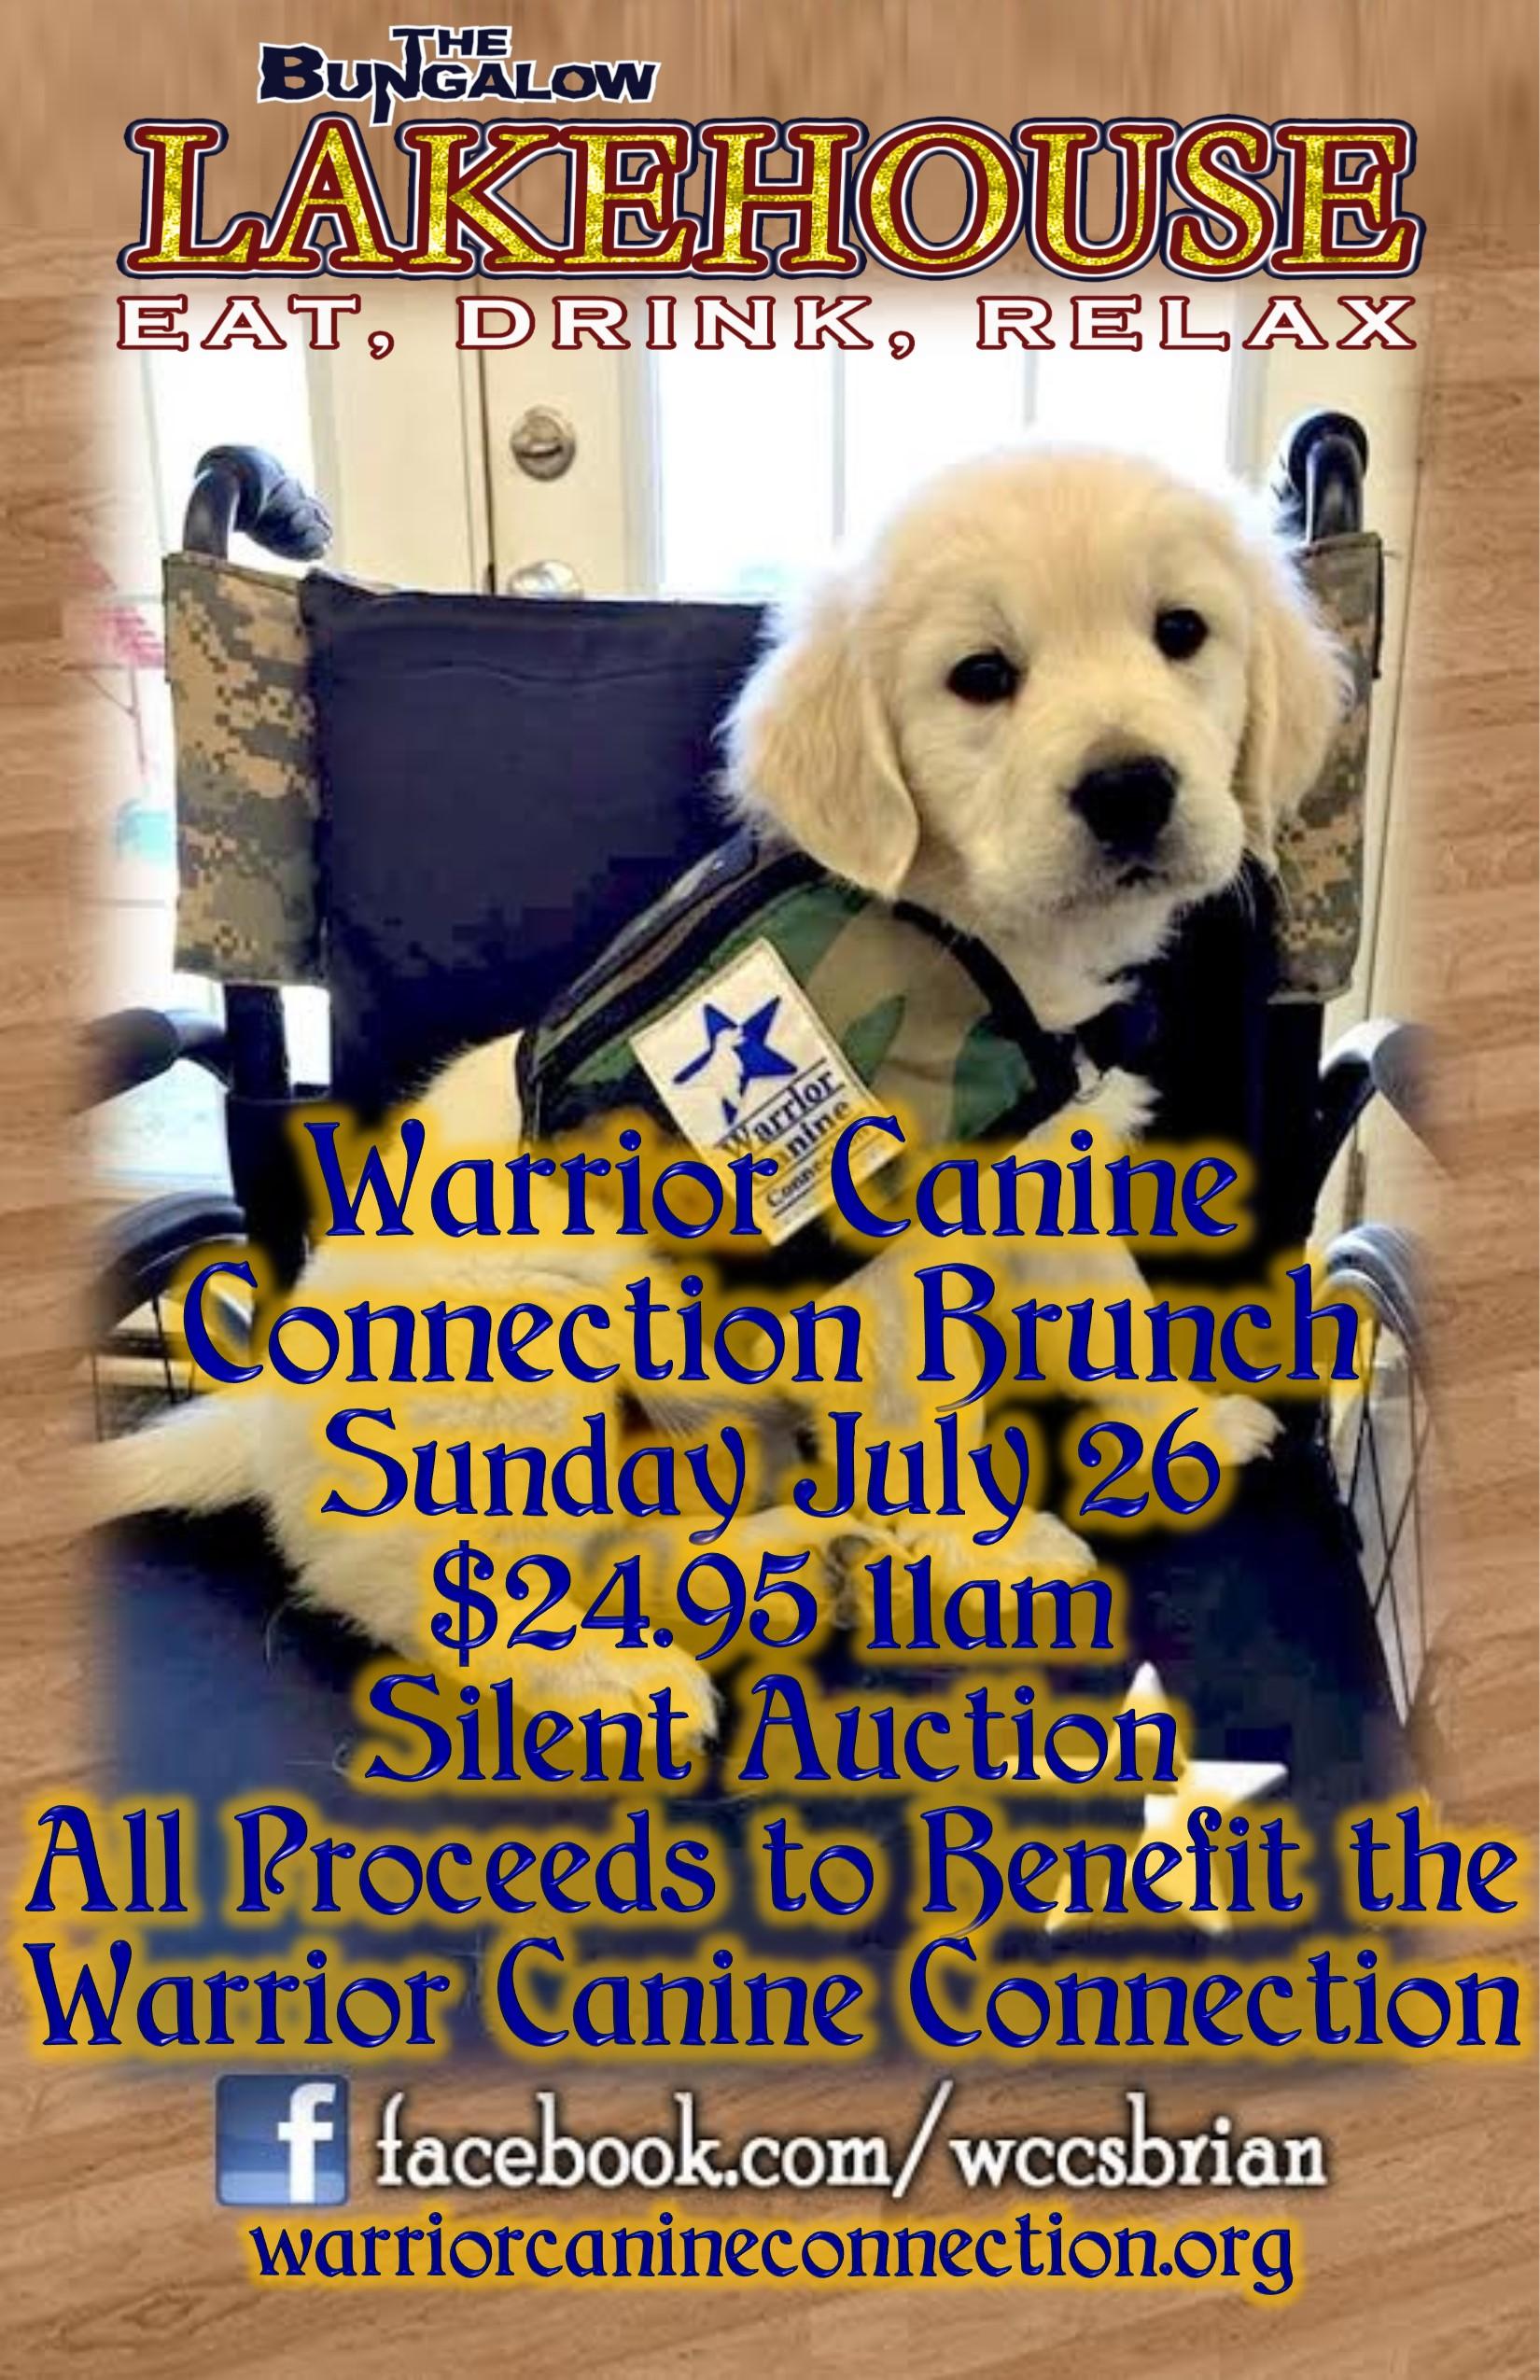 Warrior Canine brunch 2015